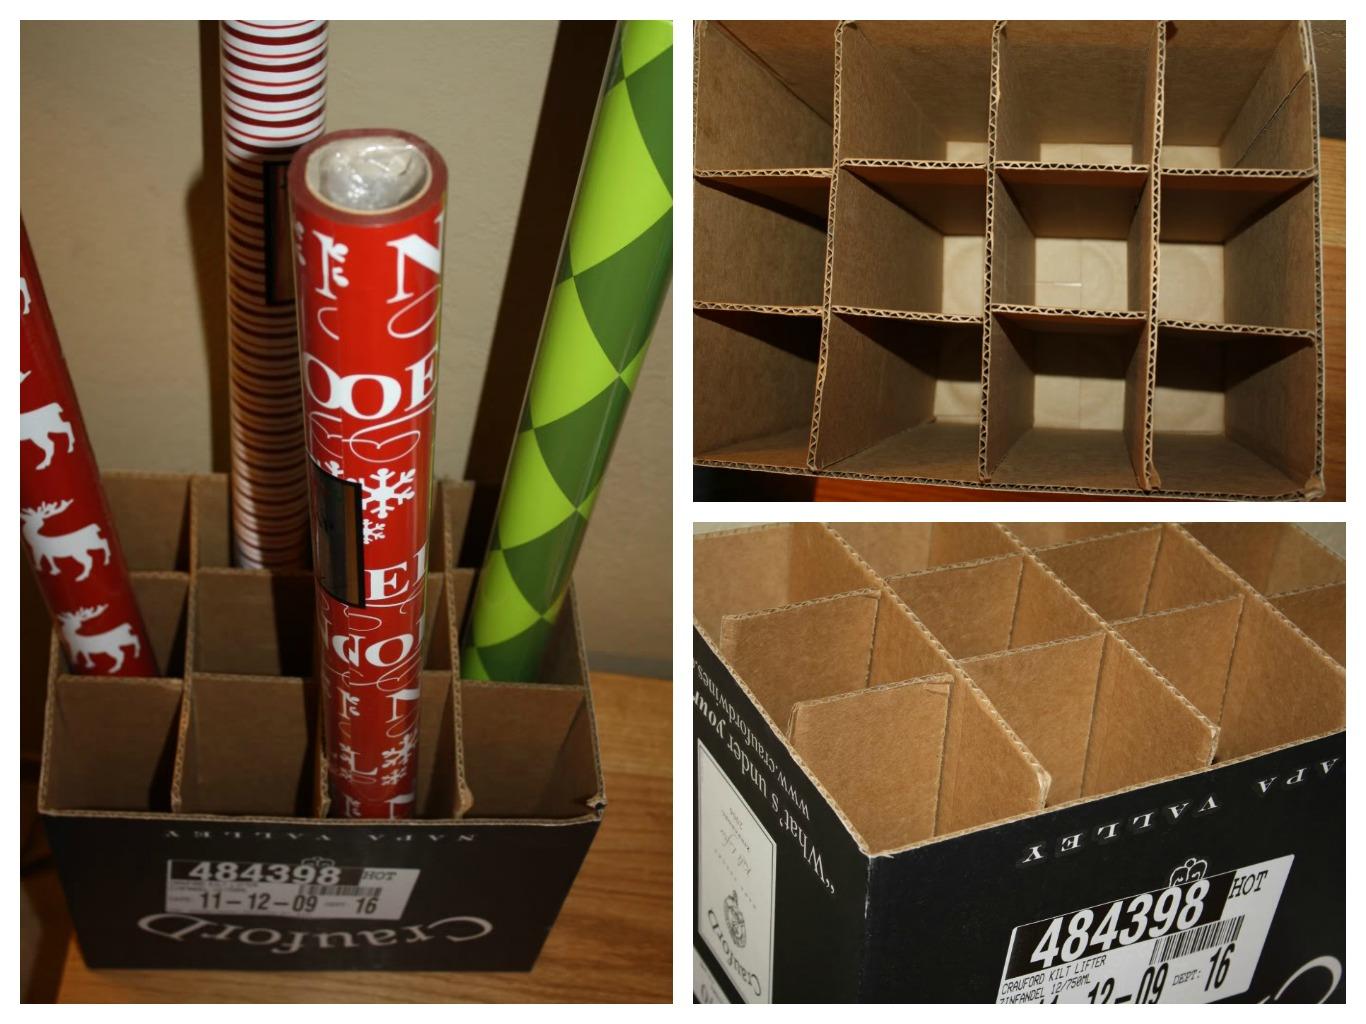 frugal wrapping paper storage system. Black Bedroom Furniture Sets. Home Design Ideas